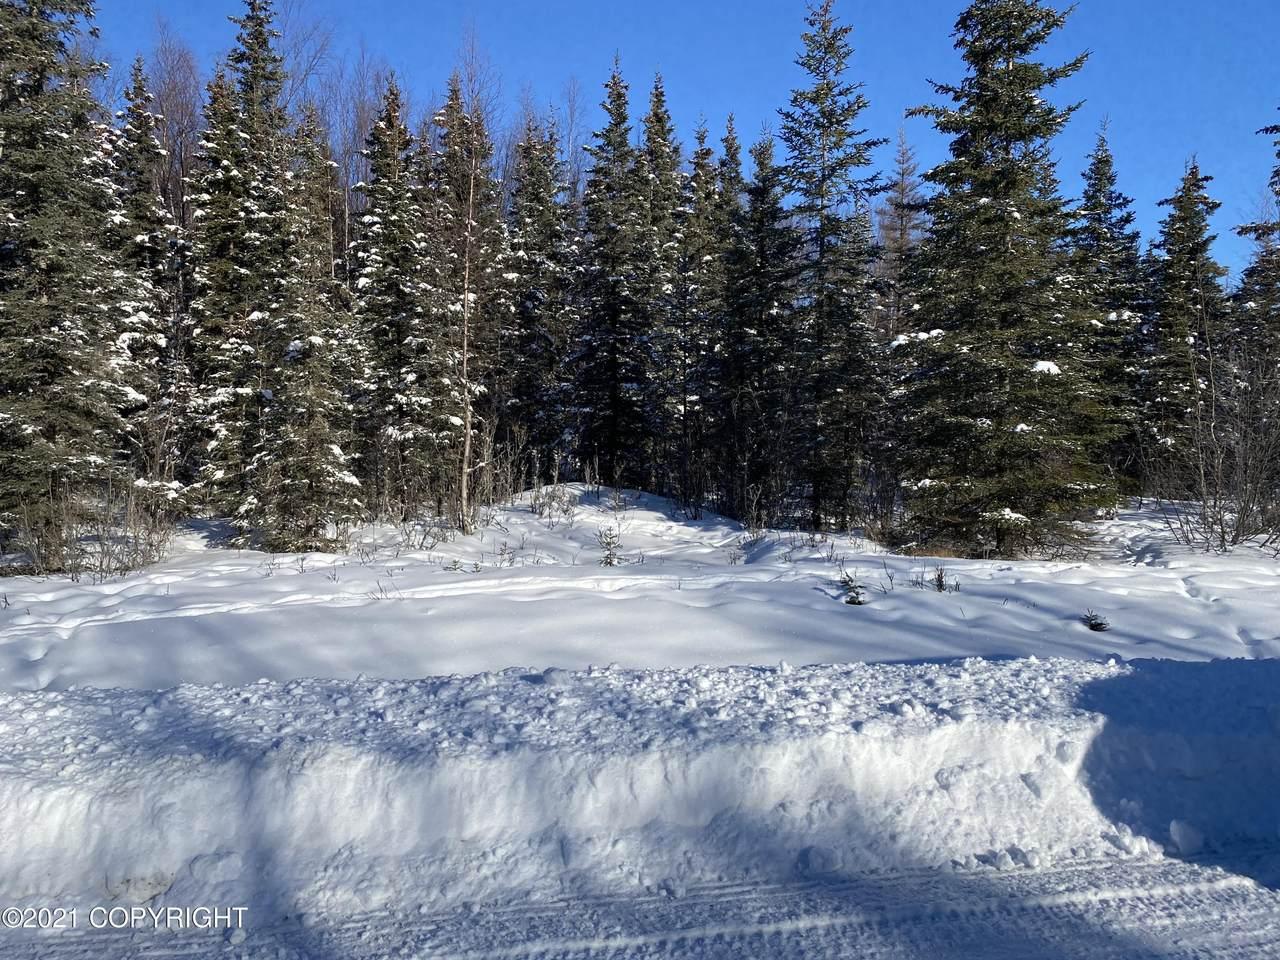 https://bt-photos.global.ssl.fastly.net/alaska/1280_boomver_1_21-2856-2.jpg